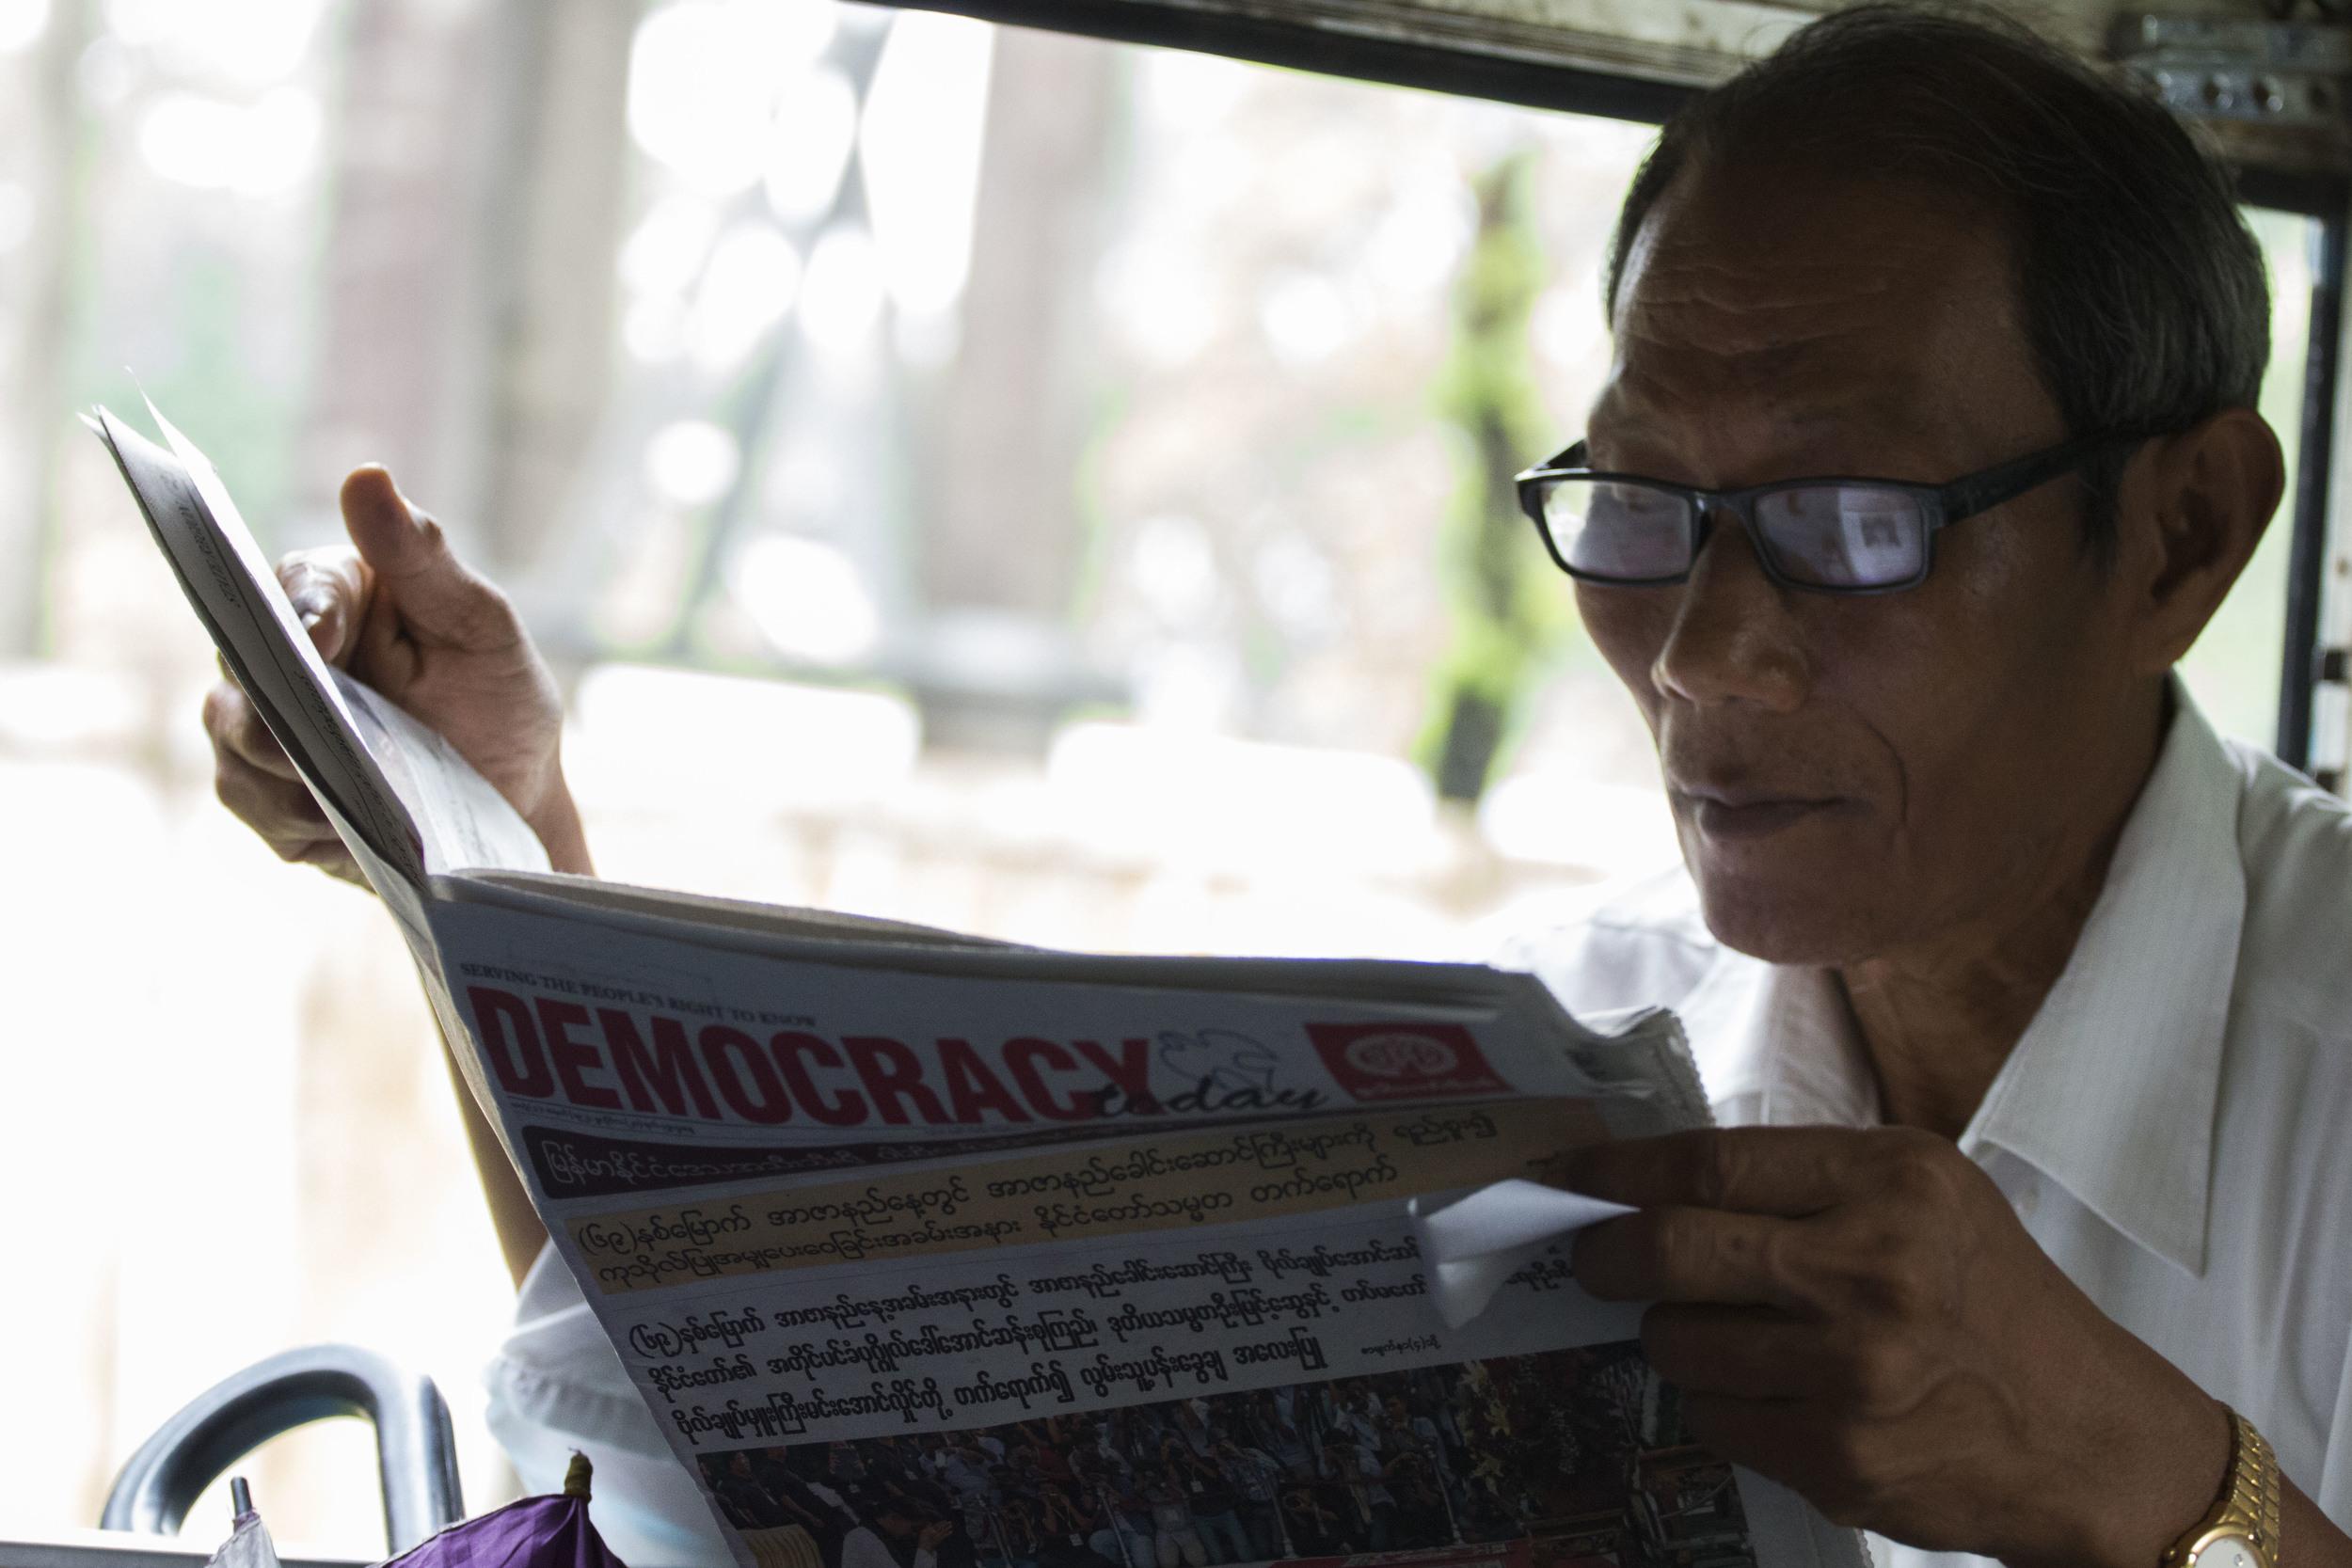 democracy paper.JPG